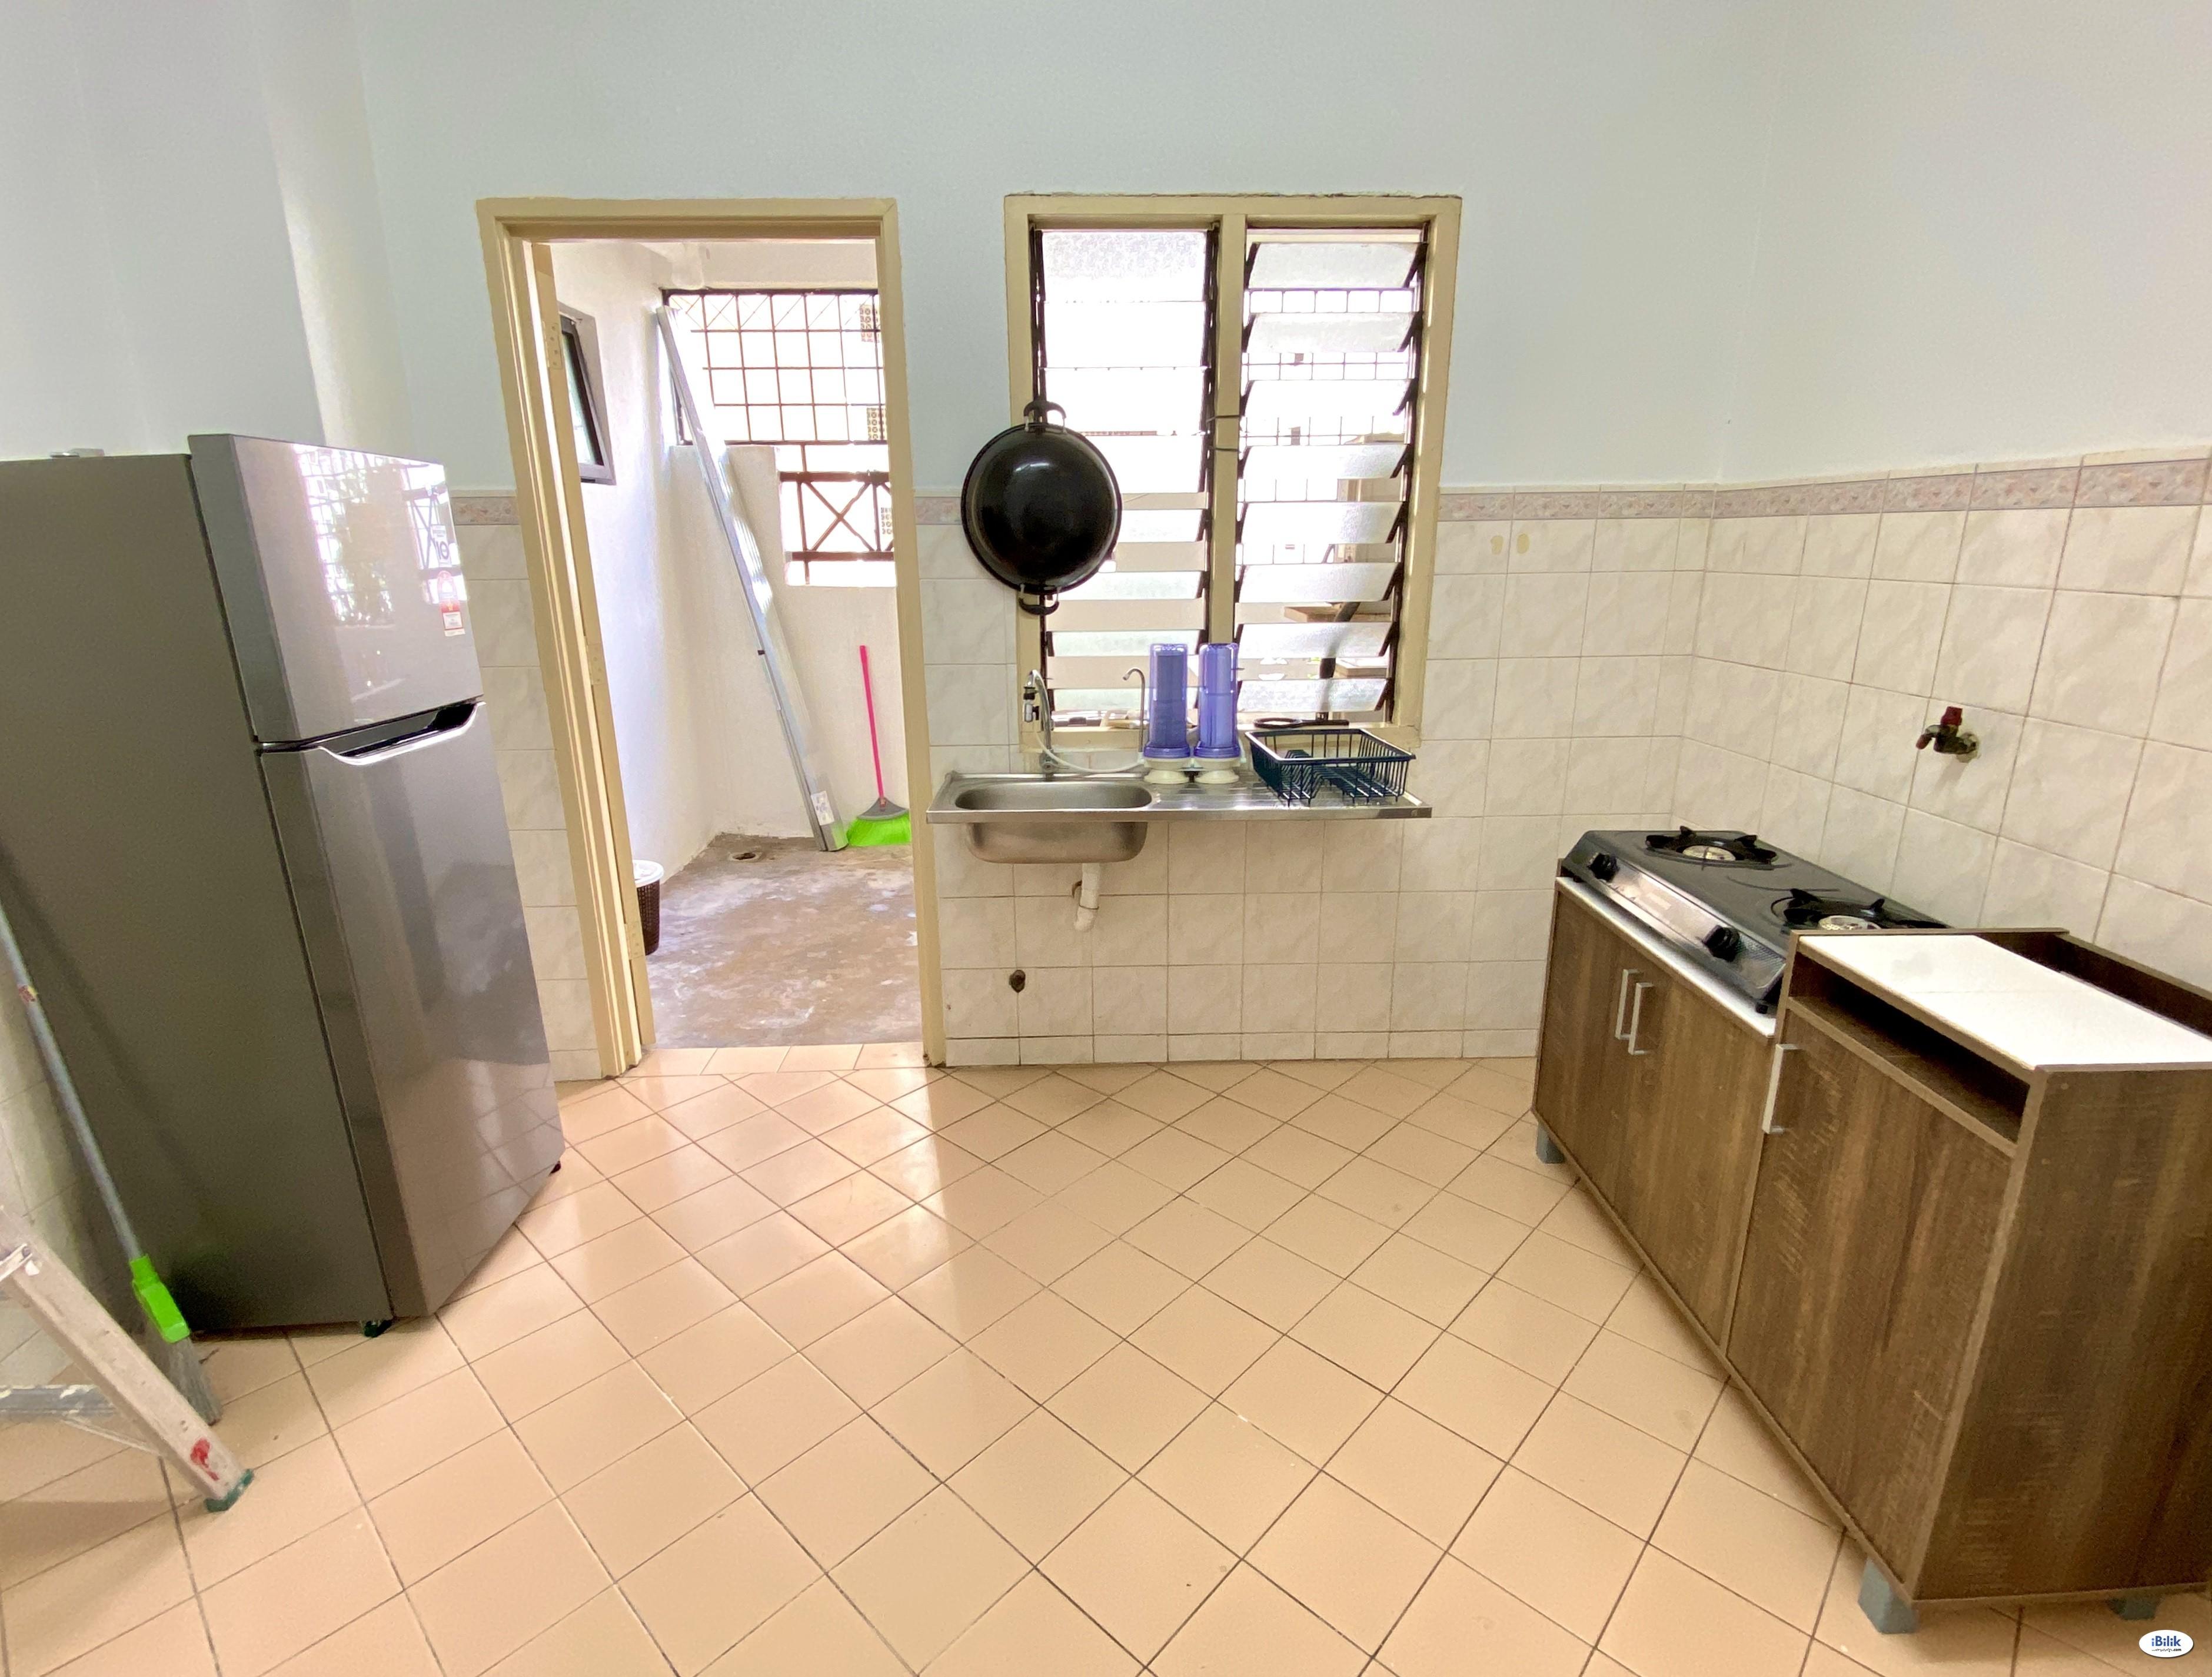 IMU room, near lrt, room include all utilities, wifi and ac.